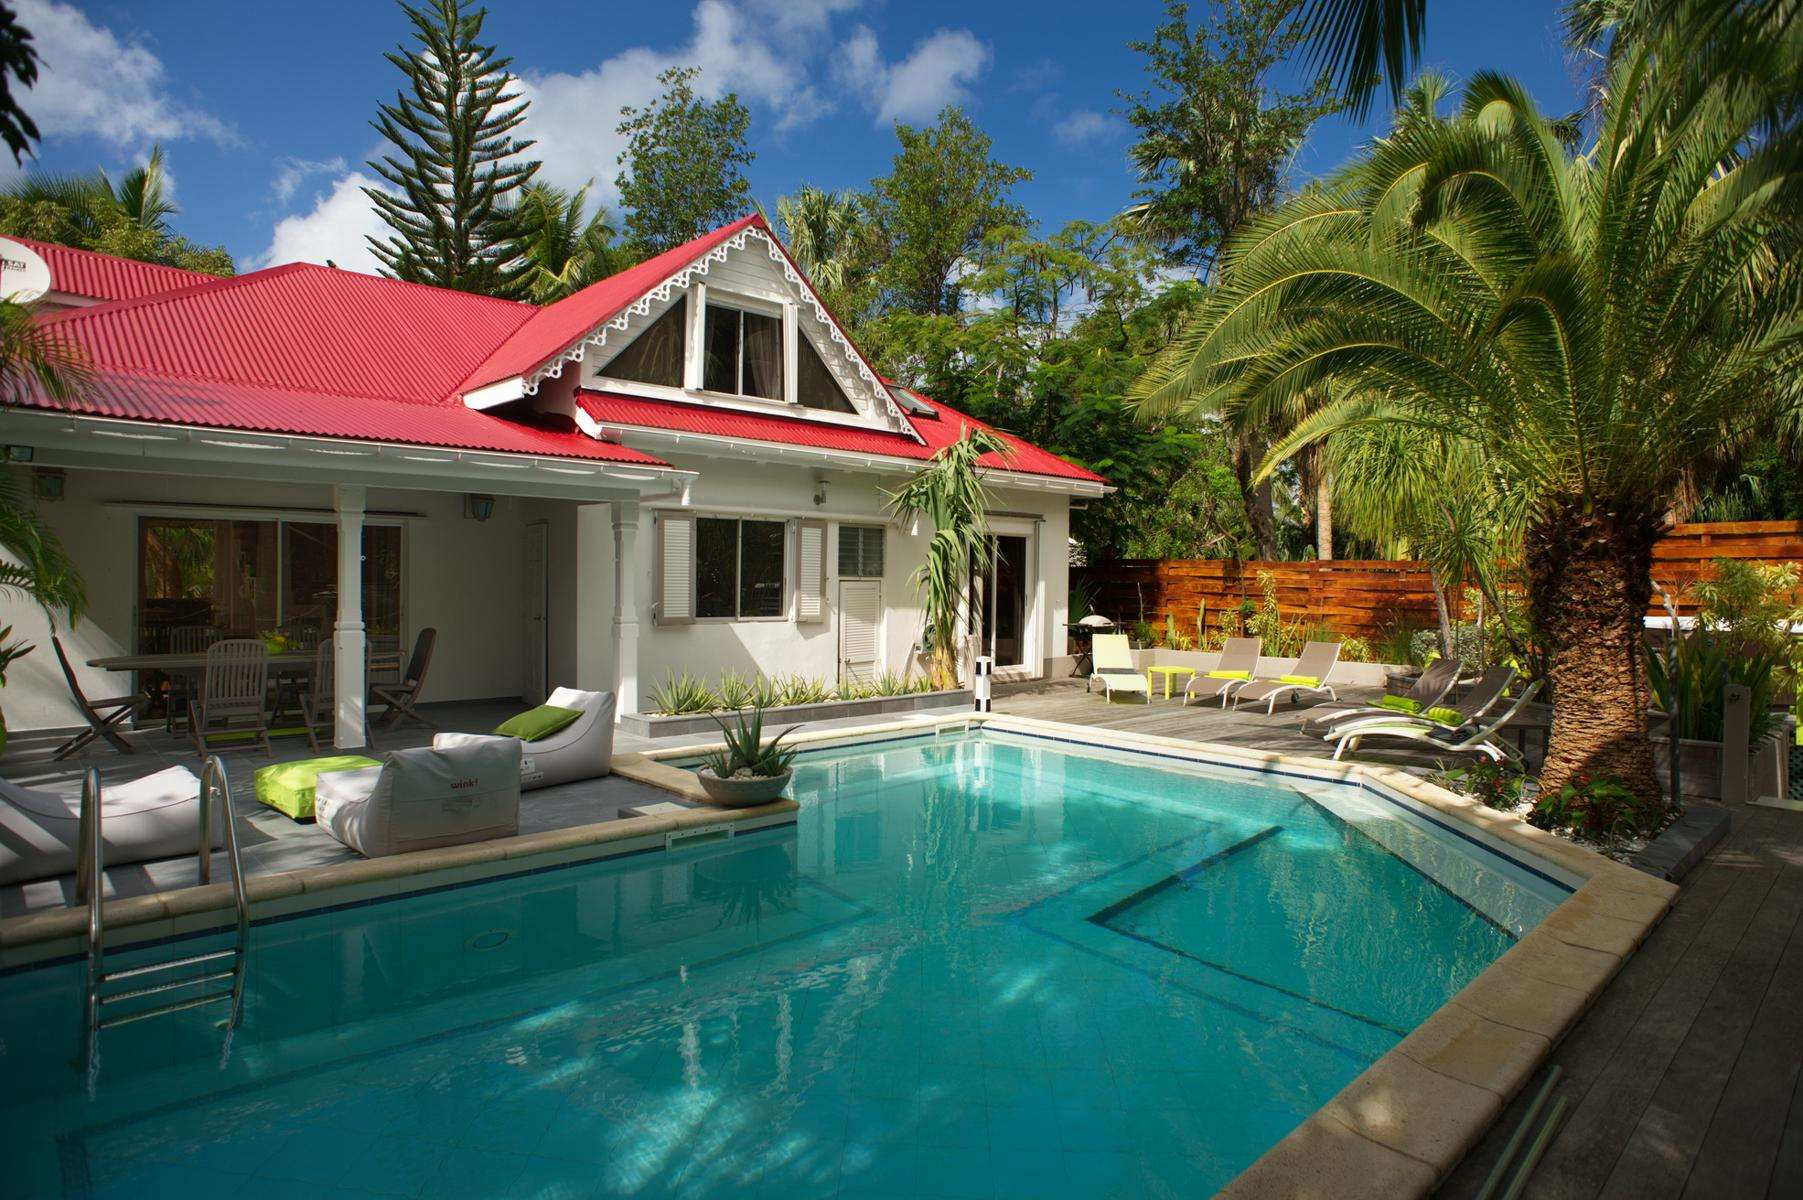 Luxury villa rentals caribbean - St barthelemy - Lorient - No location 4 - Escape - Image 1/14